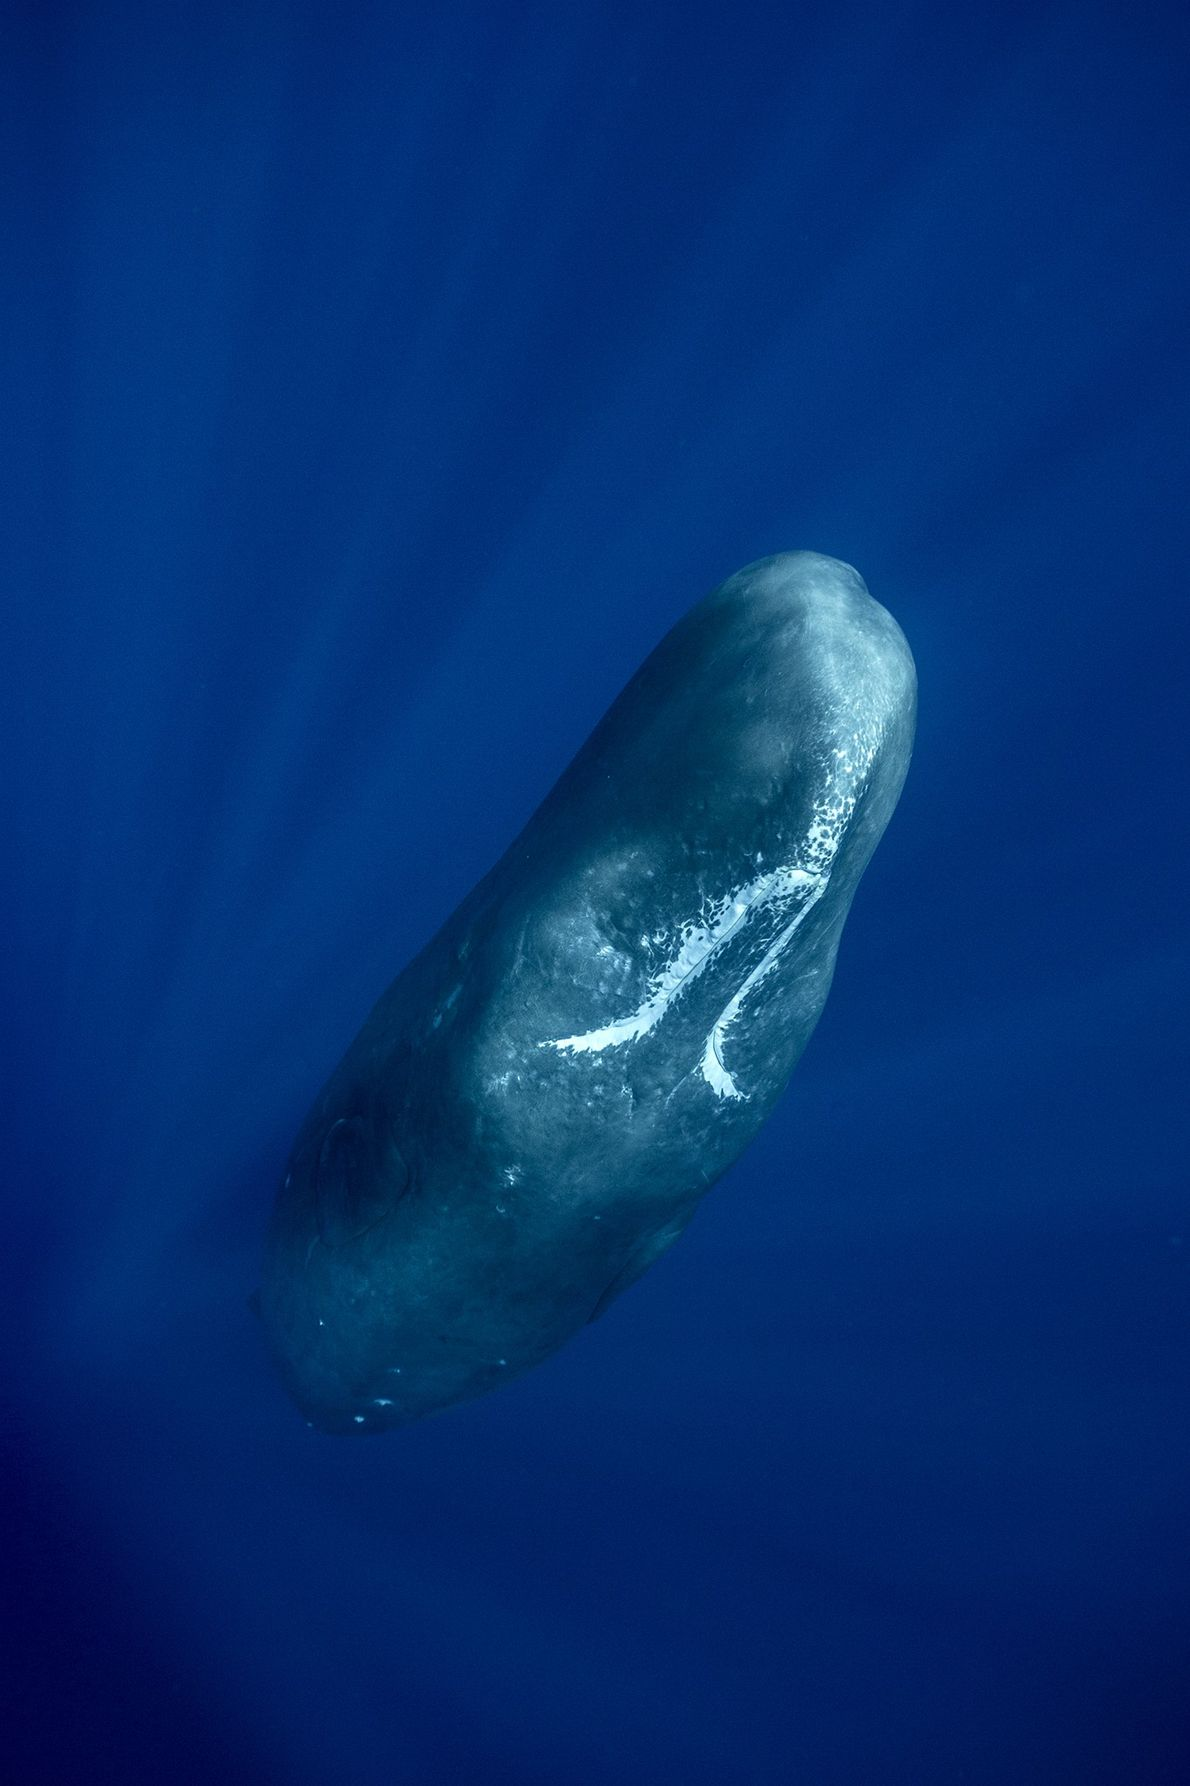 """Despite my presence, the sperm whale keep on sleeping,"" photographer Stephane Granzotto said."